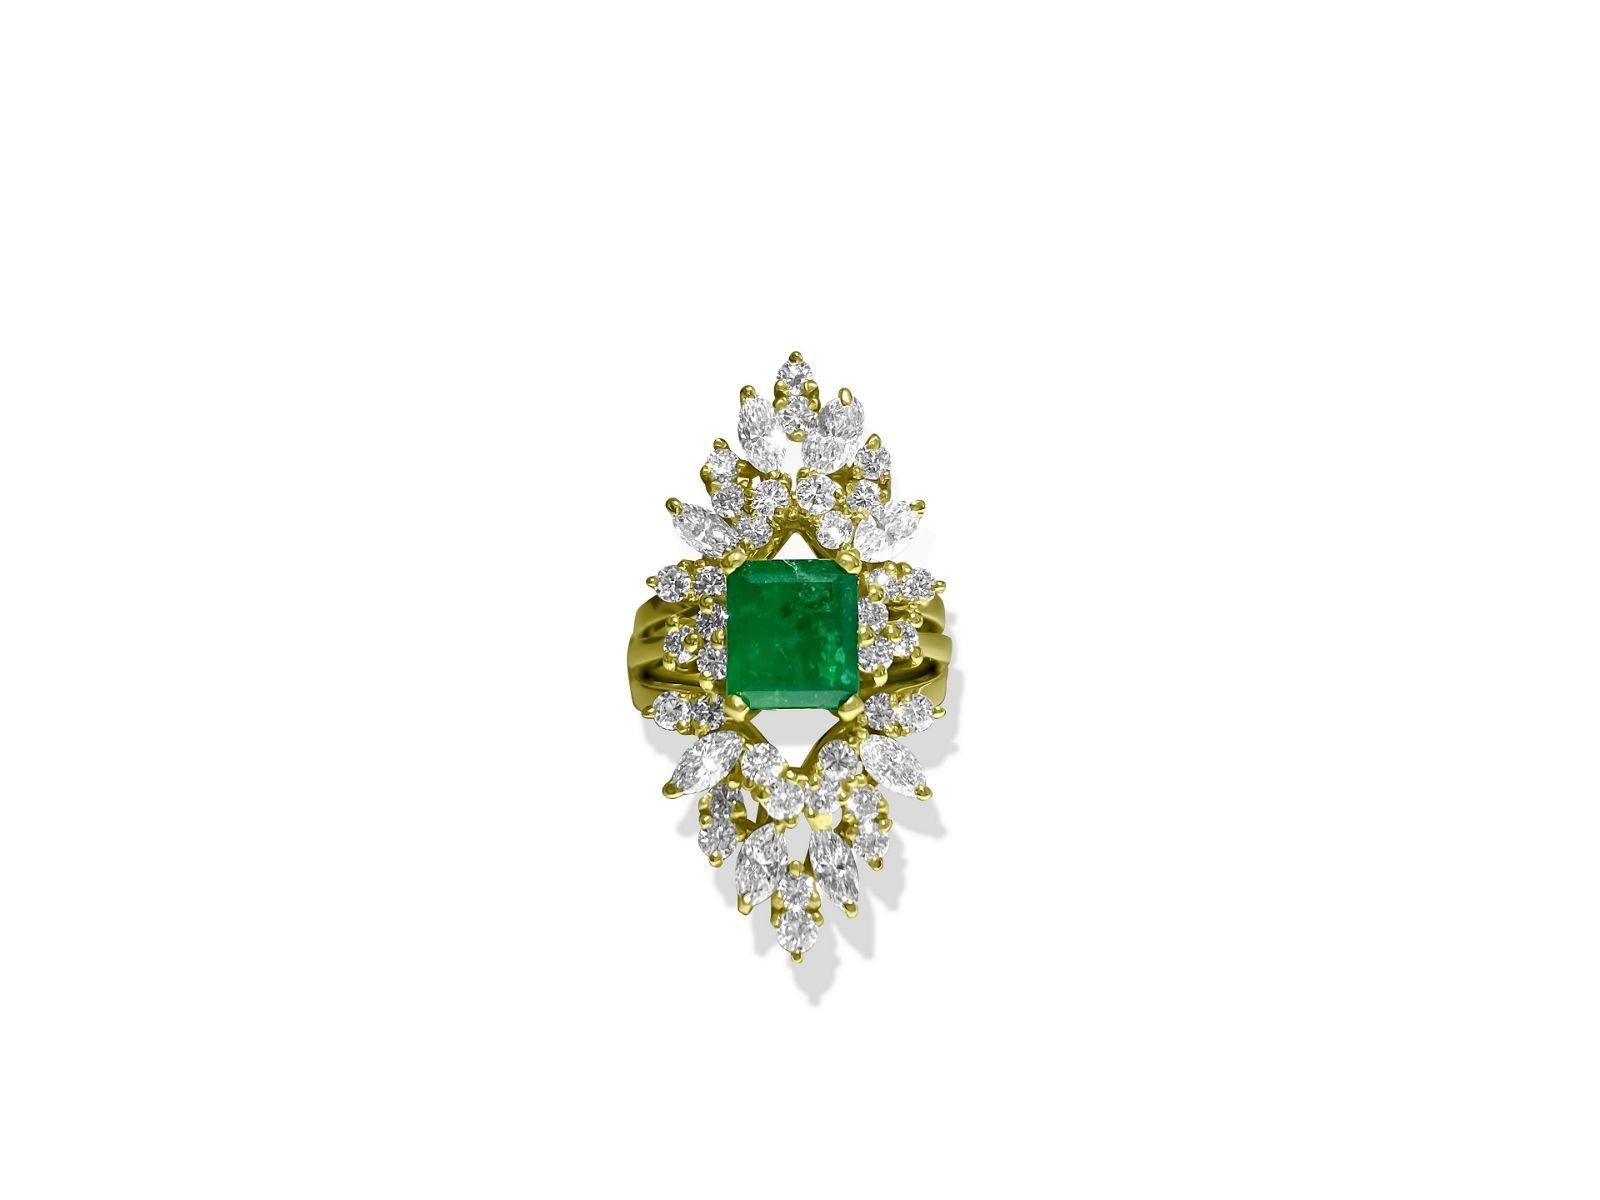 14K Yellow Gold, 4.25 CT Diamond & Emerald Insert Ring